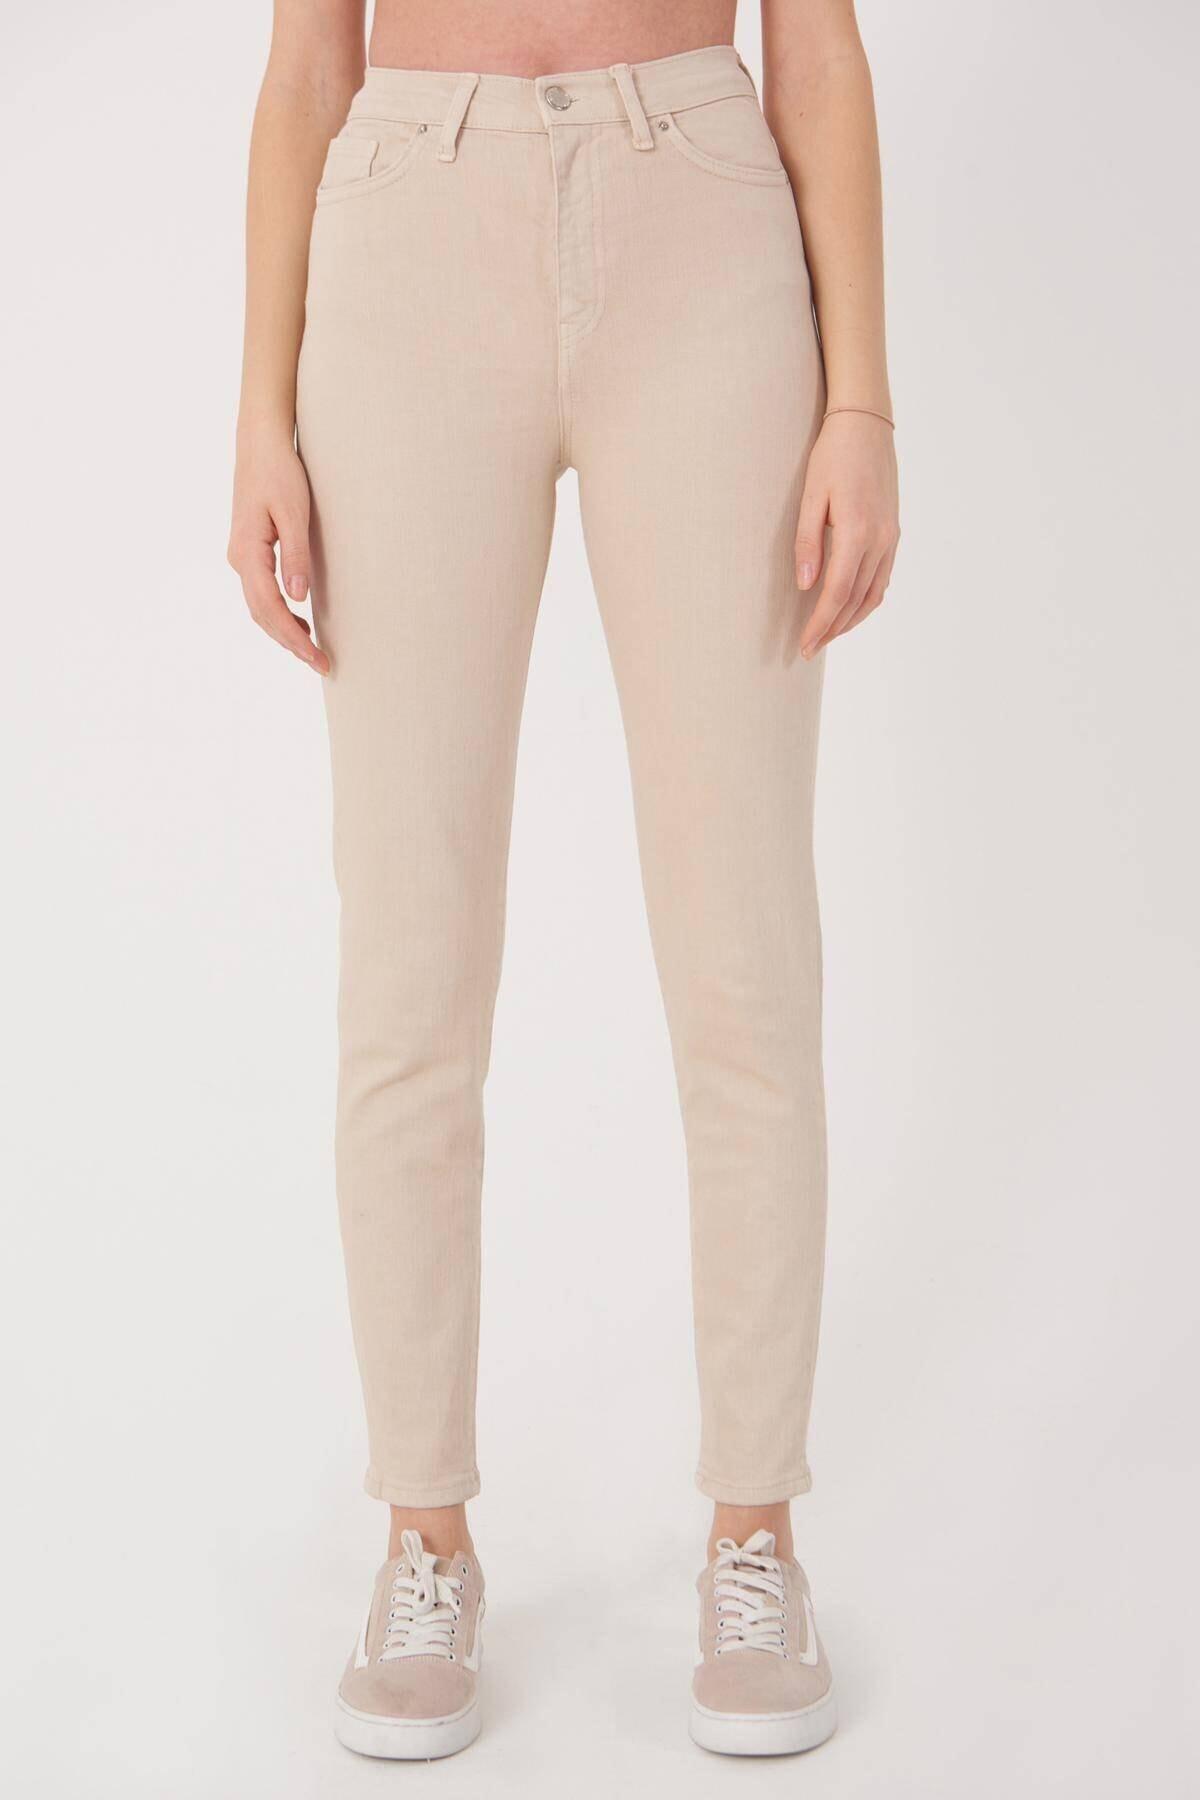 Addax Kadın Taş Yüksek Bel Cep Detaylı Pantolon Pn4442 - Pnk Adx-0000023716